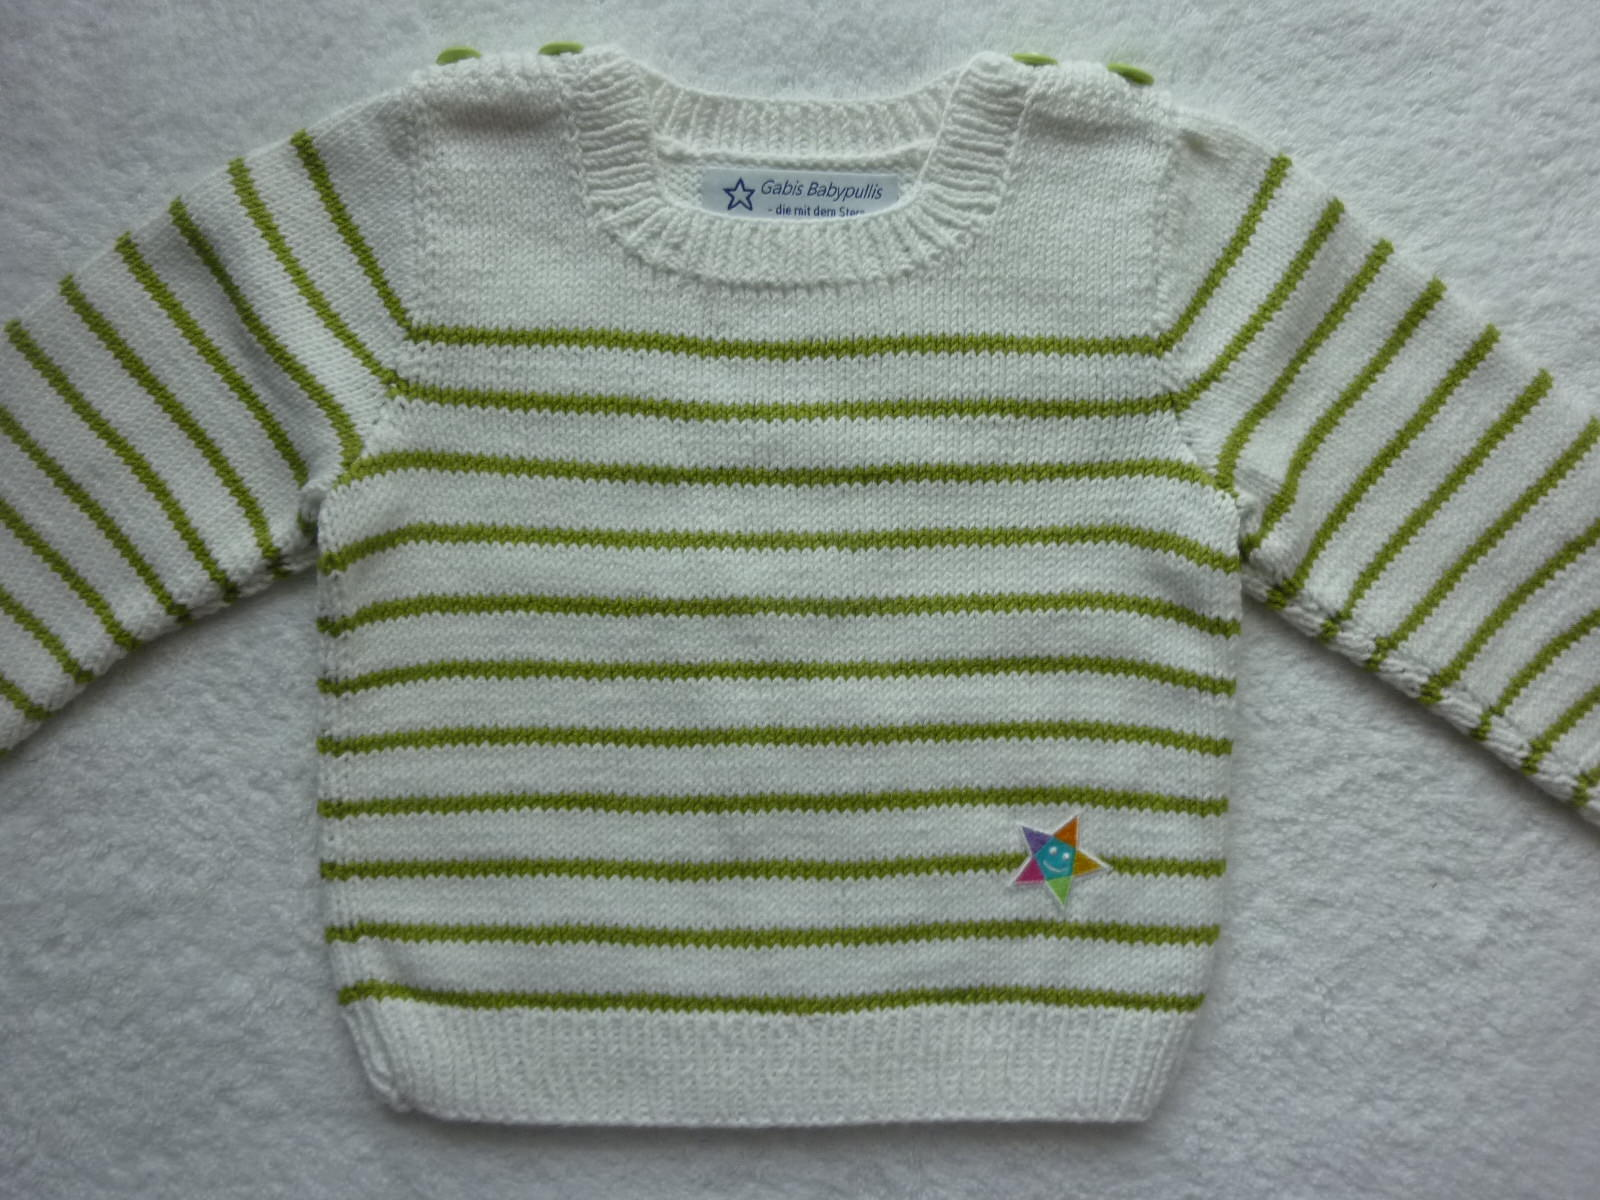 - Kinderpullover Gr. 86/92 weiß hellgrün gestreift aus Baumwolle handgestrickt - Kinderpullover Gr. 86/92 weiß hellgrün gestreift aus Baumwolle handgestrickt